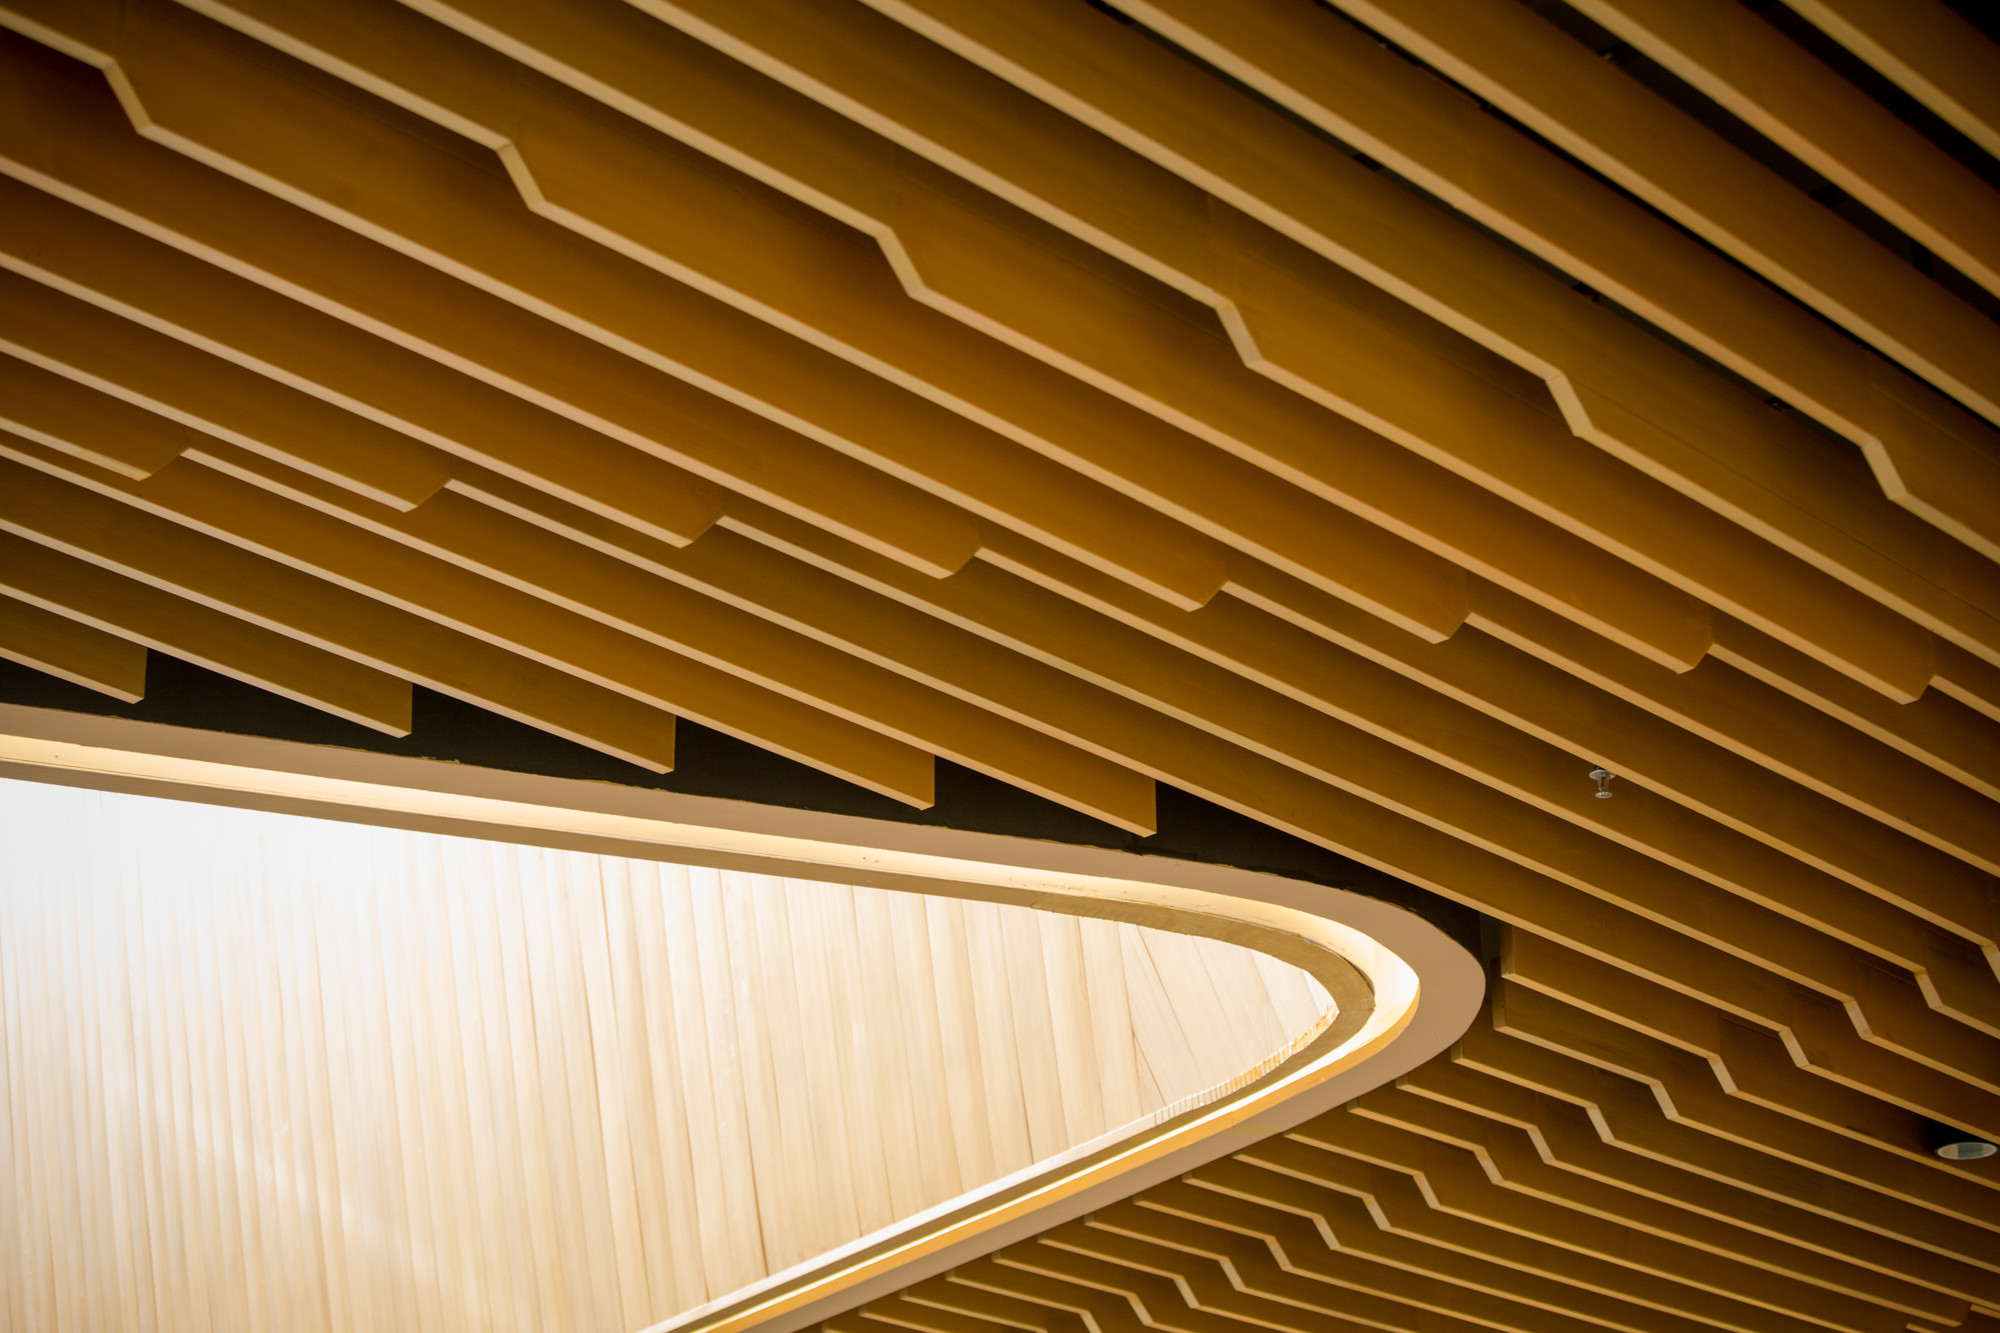 Attirant Courtesy Of Synthesis Design + Architecture